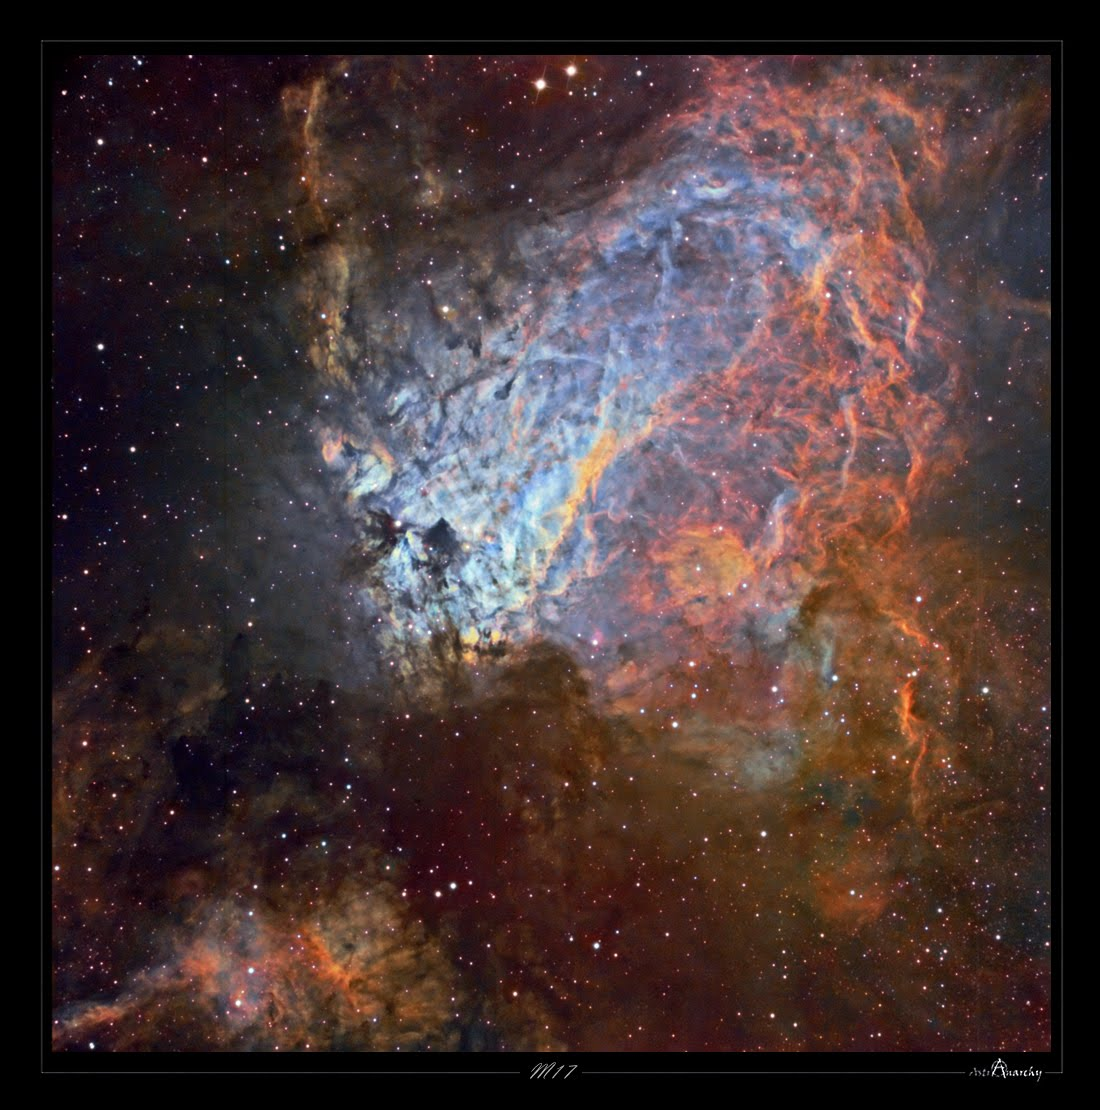 Eagle M and Omega M Nebulae